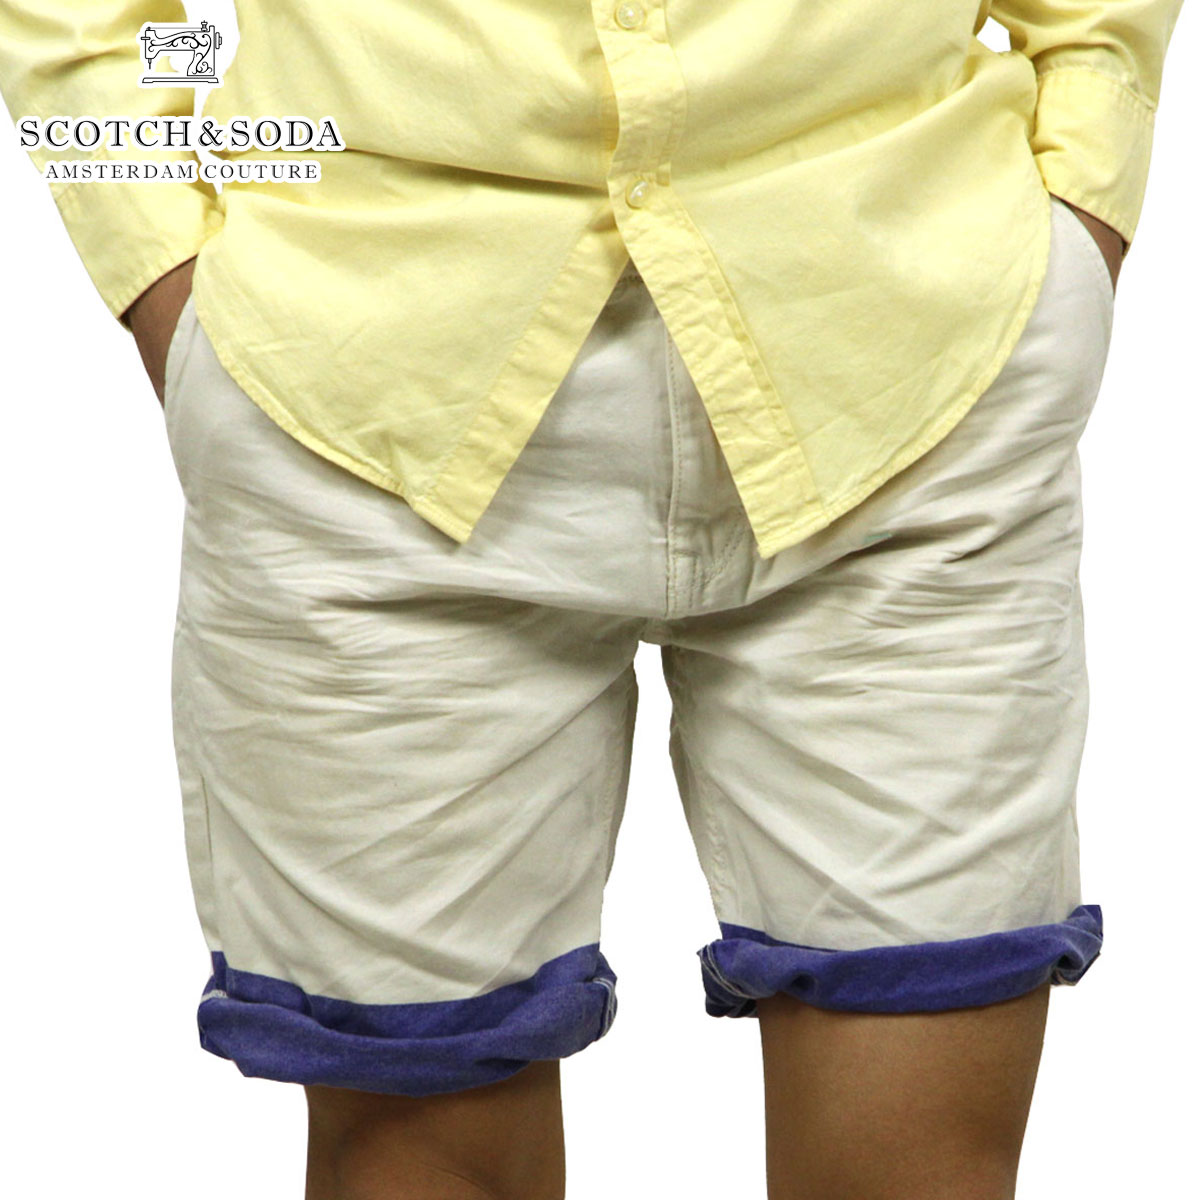 【30%OFFセール 4/21 10:00〜4/24 09:59】 スコッチアンドソーダ SCOTCH&SODA 正規販売店 メンズ ショートパンツ Freeman Chino short - Canvas Garment Dyes 87093 13